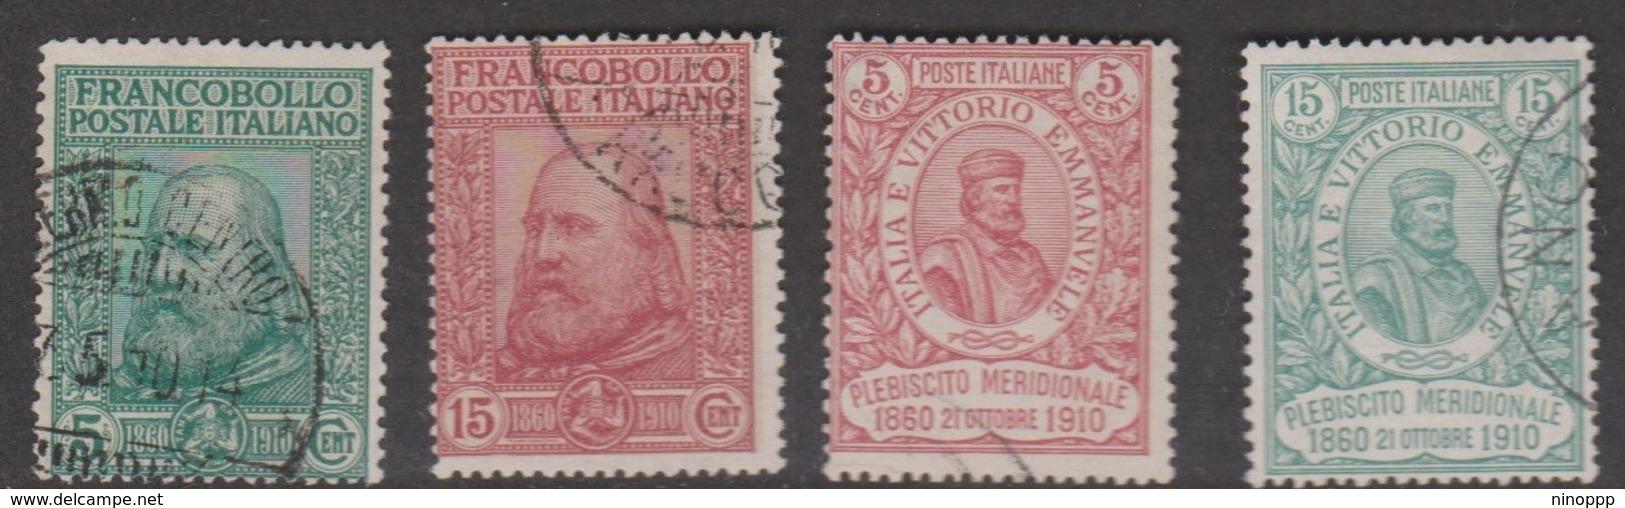 Italy S 87-90 1910 50th Anniversary Of Plebiscite And Freedom Of Sicily, Used - 1900-44 Vittorio Emanuele III